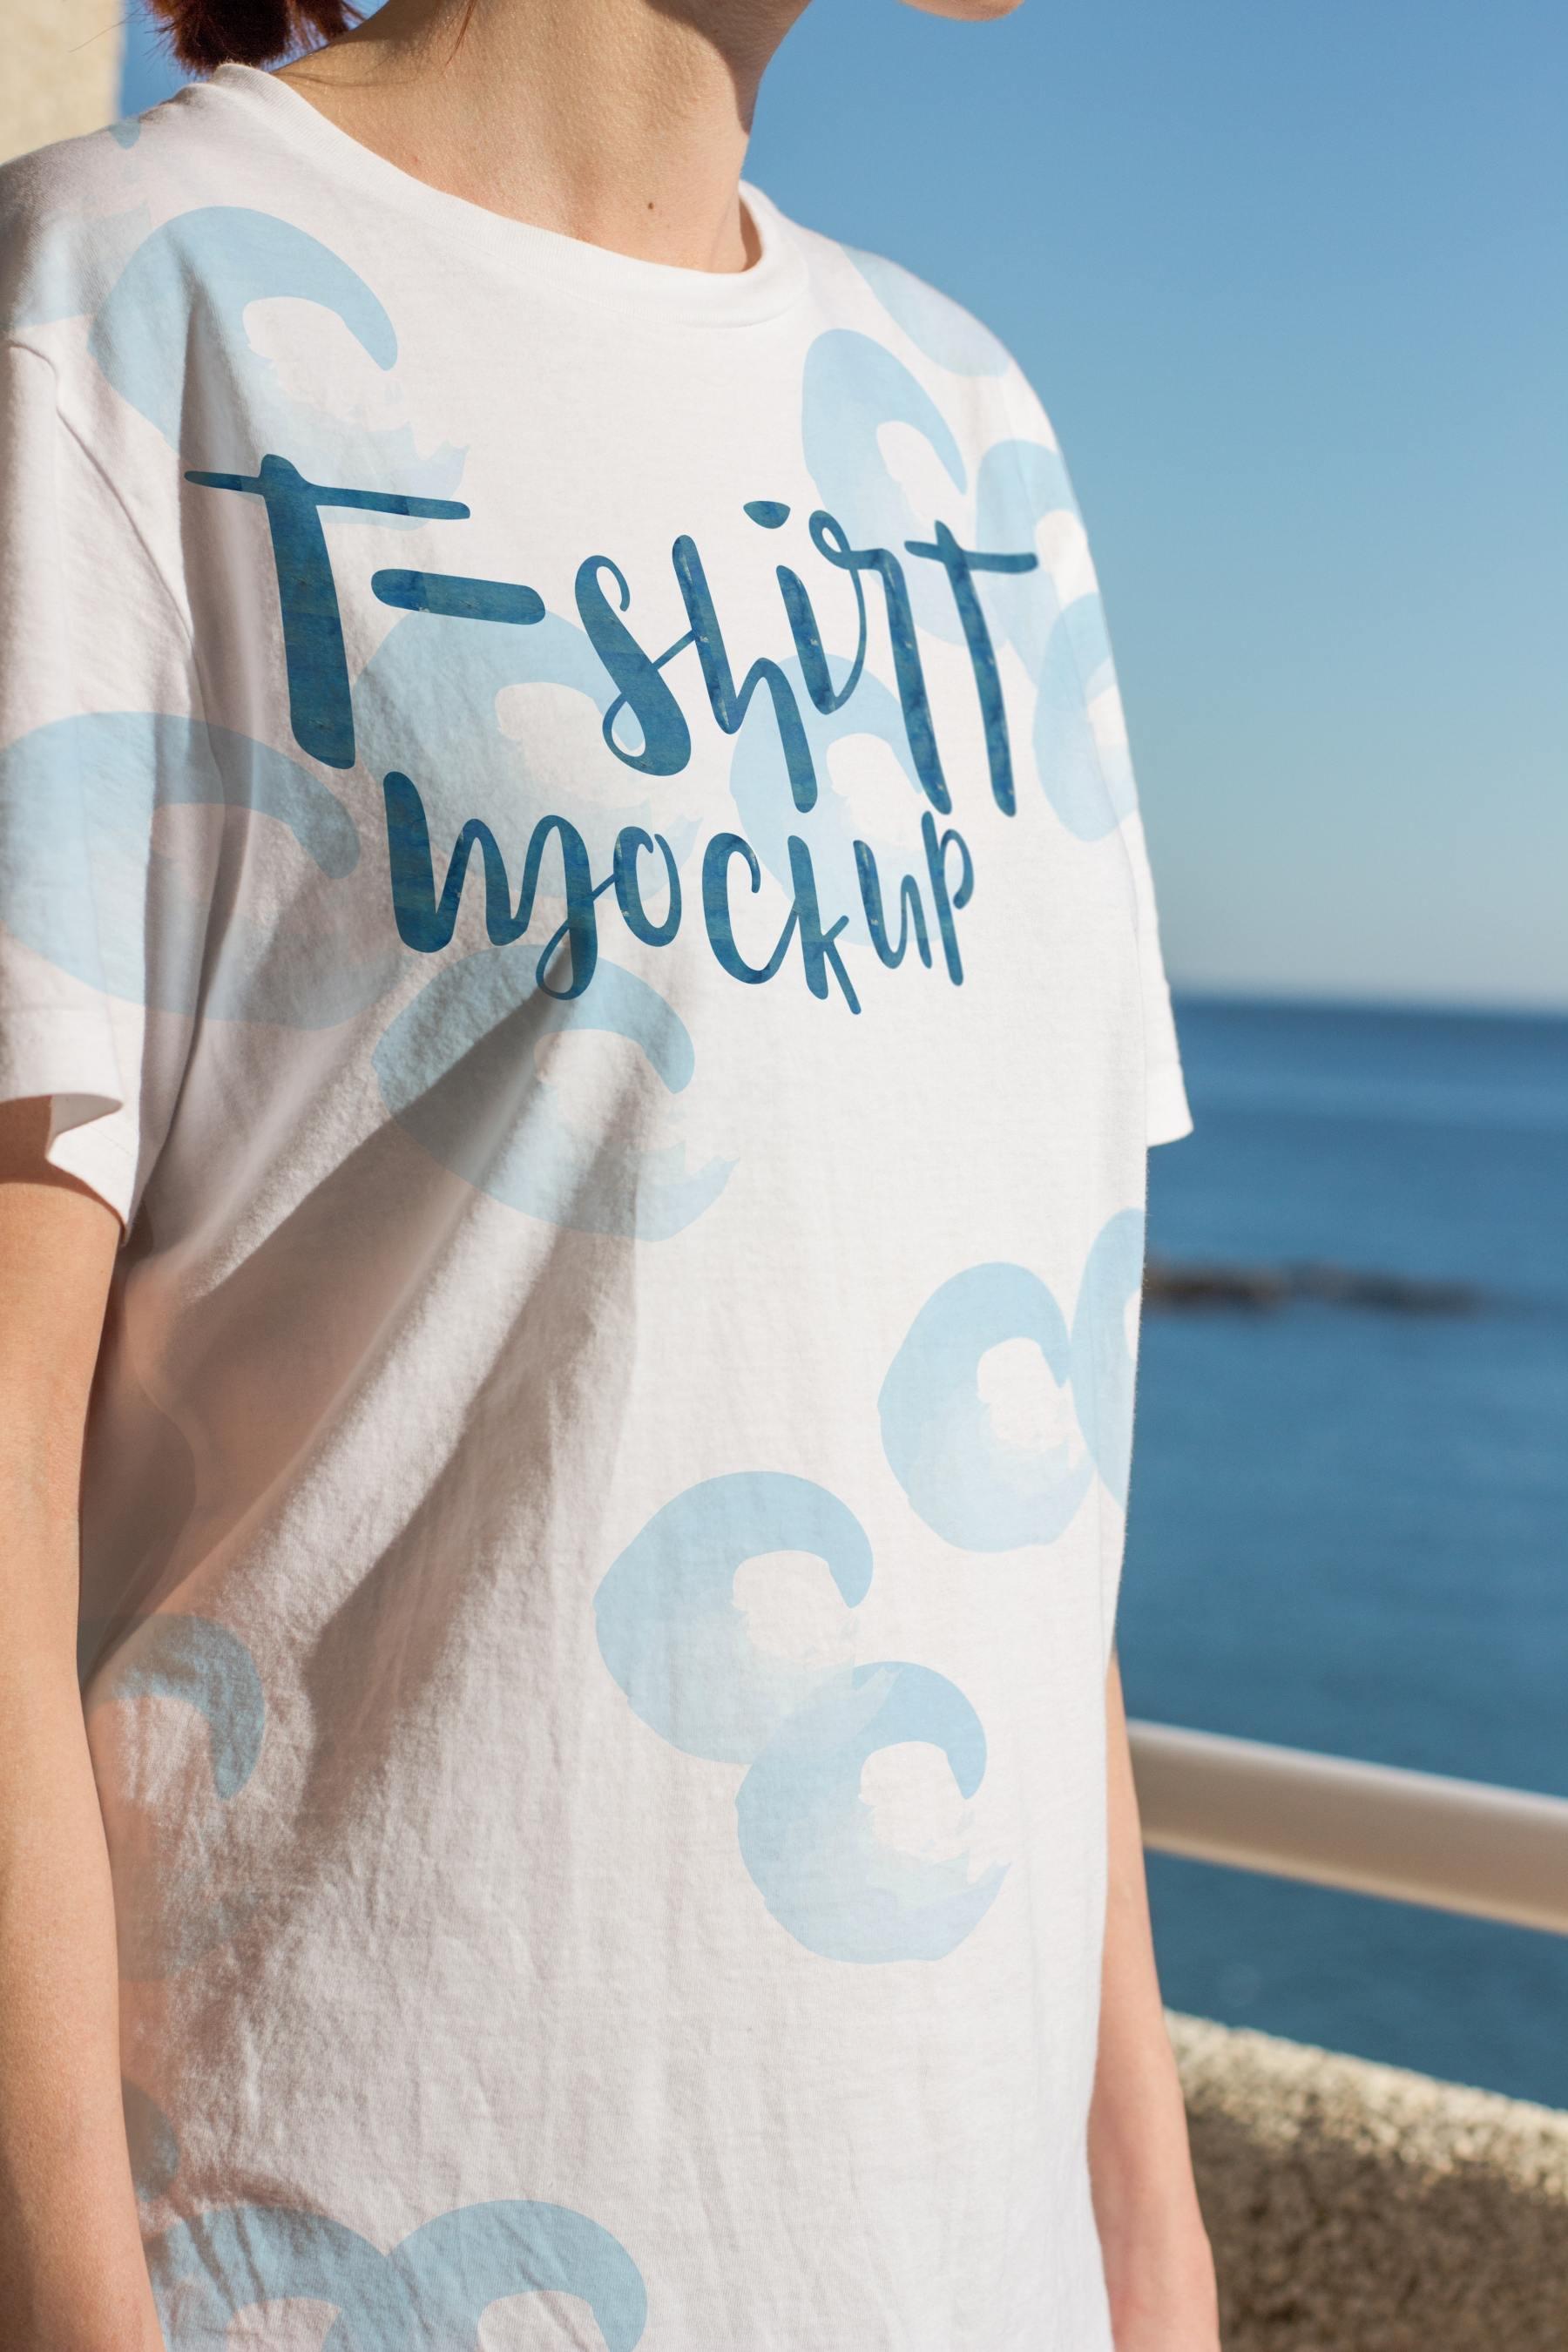 afb118660638e1a - 潮流印花短袖T恤女款模特服饰上装样机